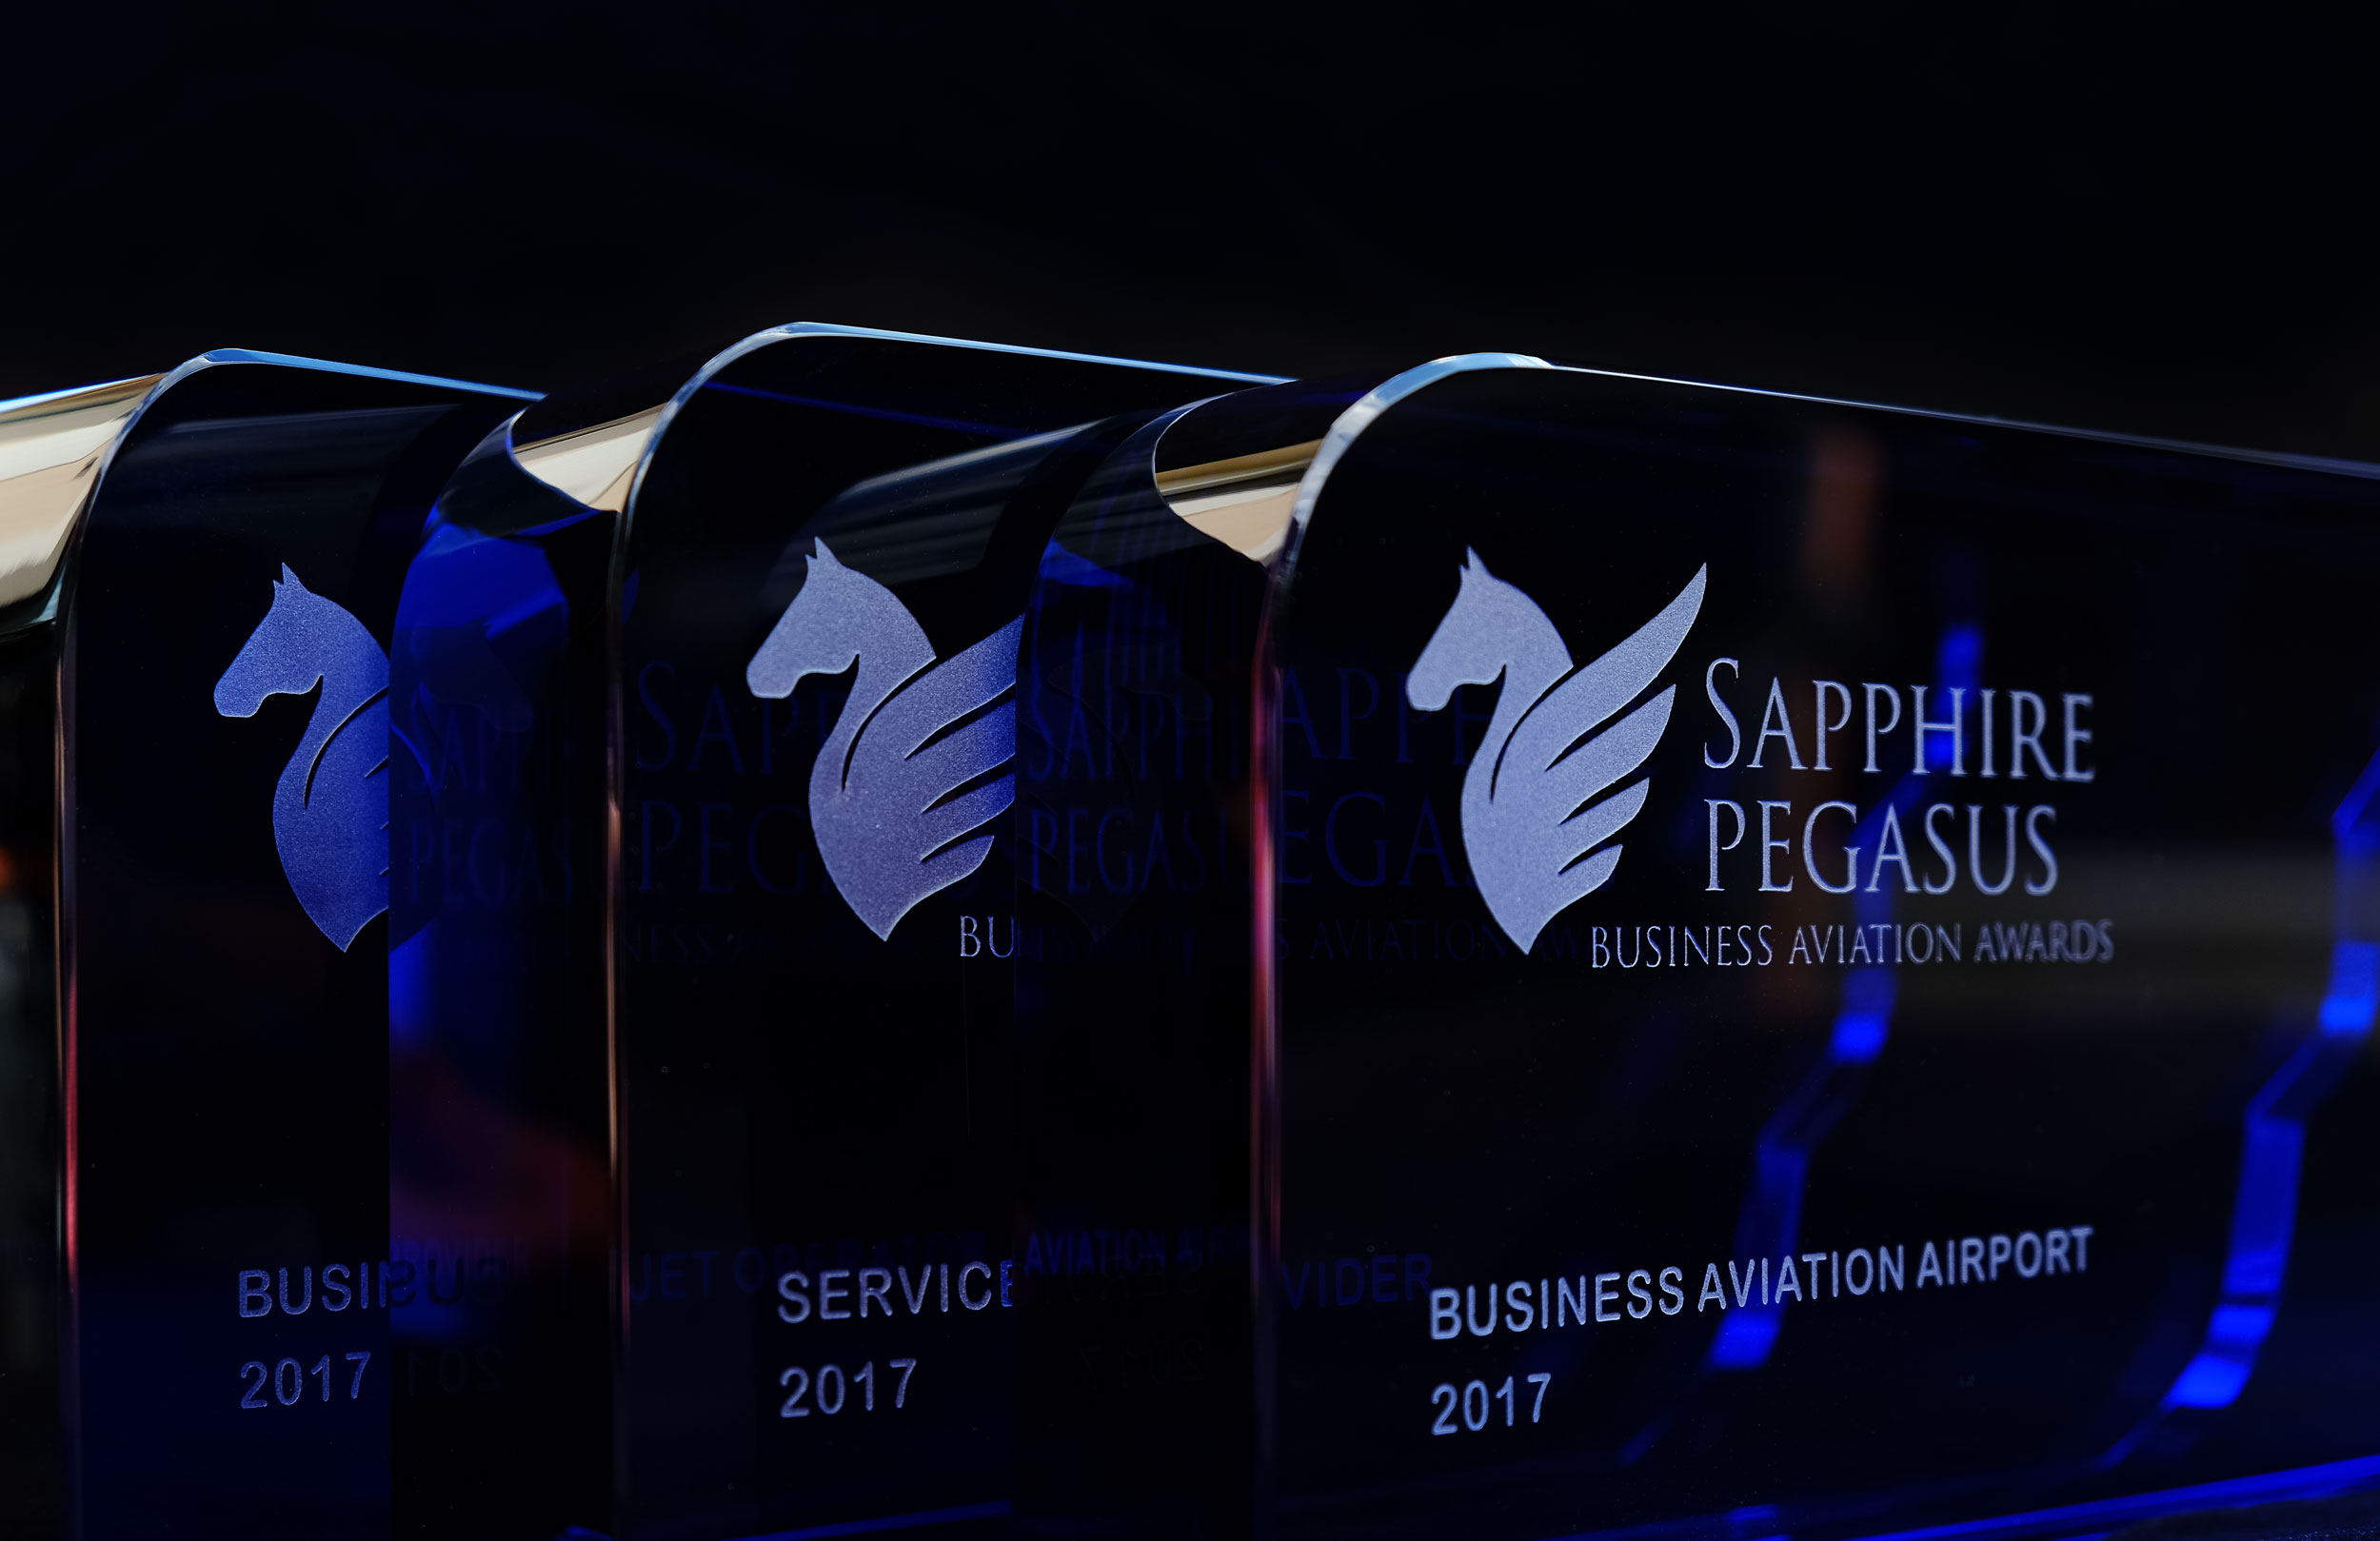 SPBAA Awards 2017